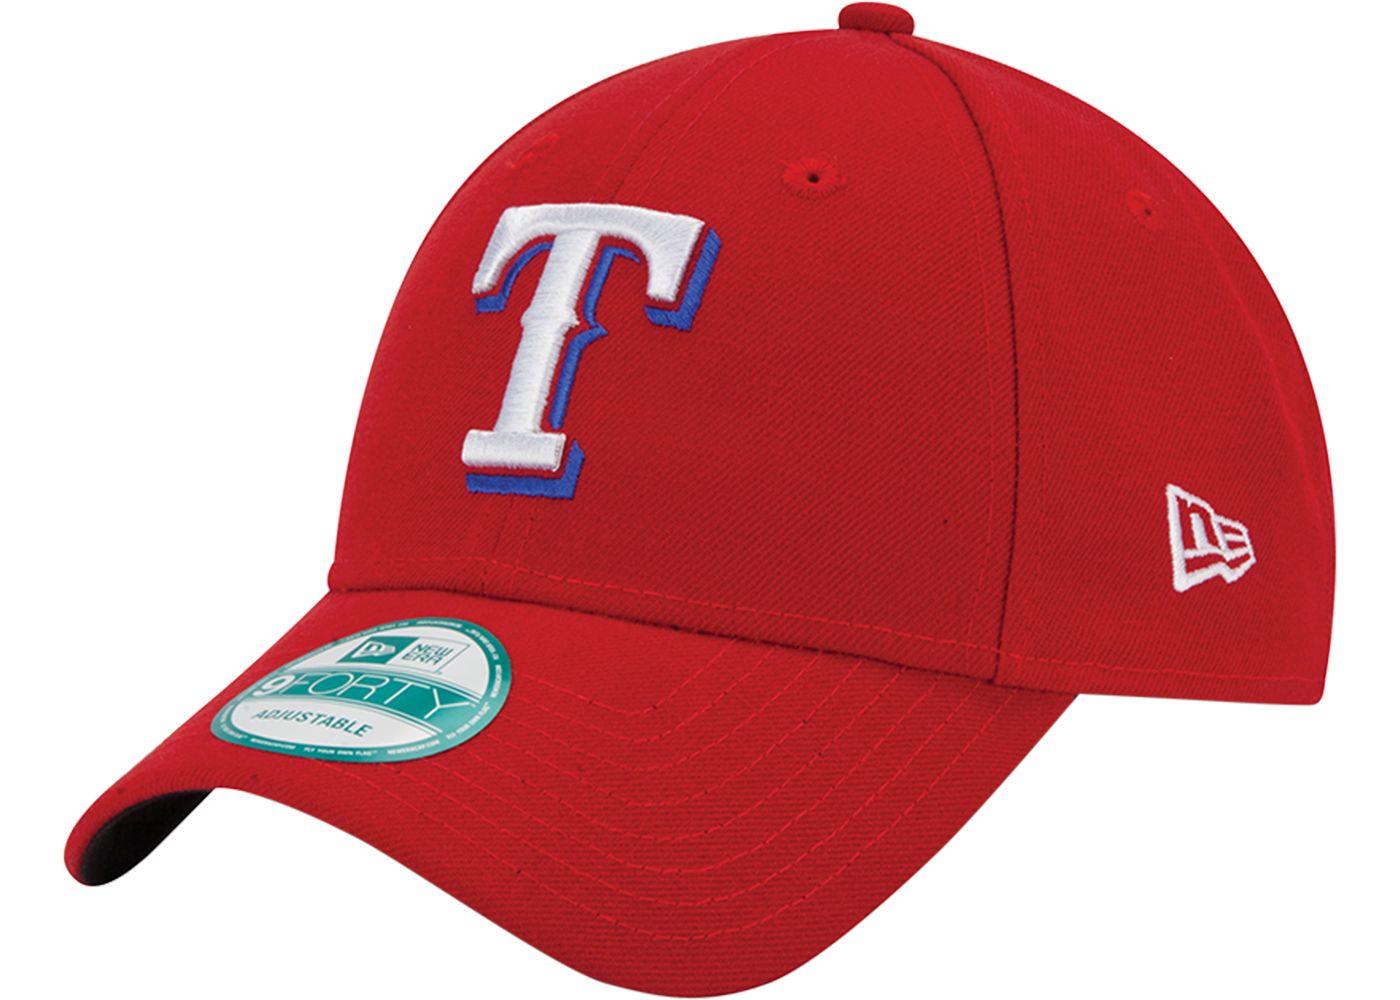 New Era Men's Texas Rangers 9Forty Red Adjustable Hat